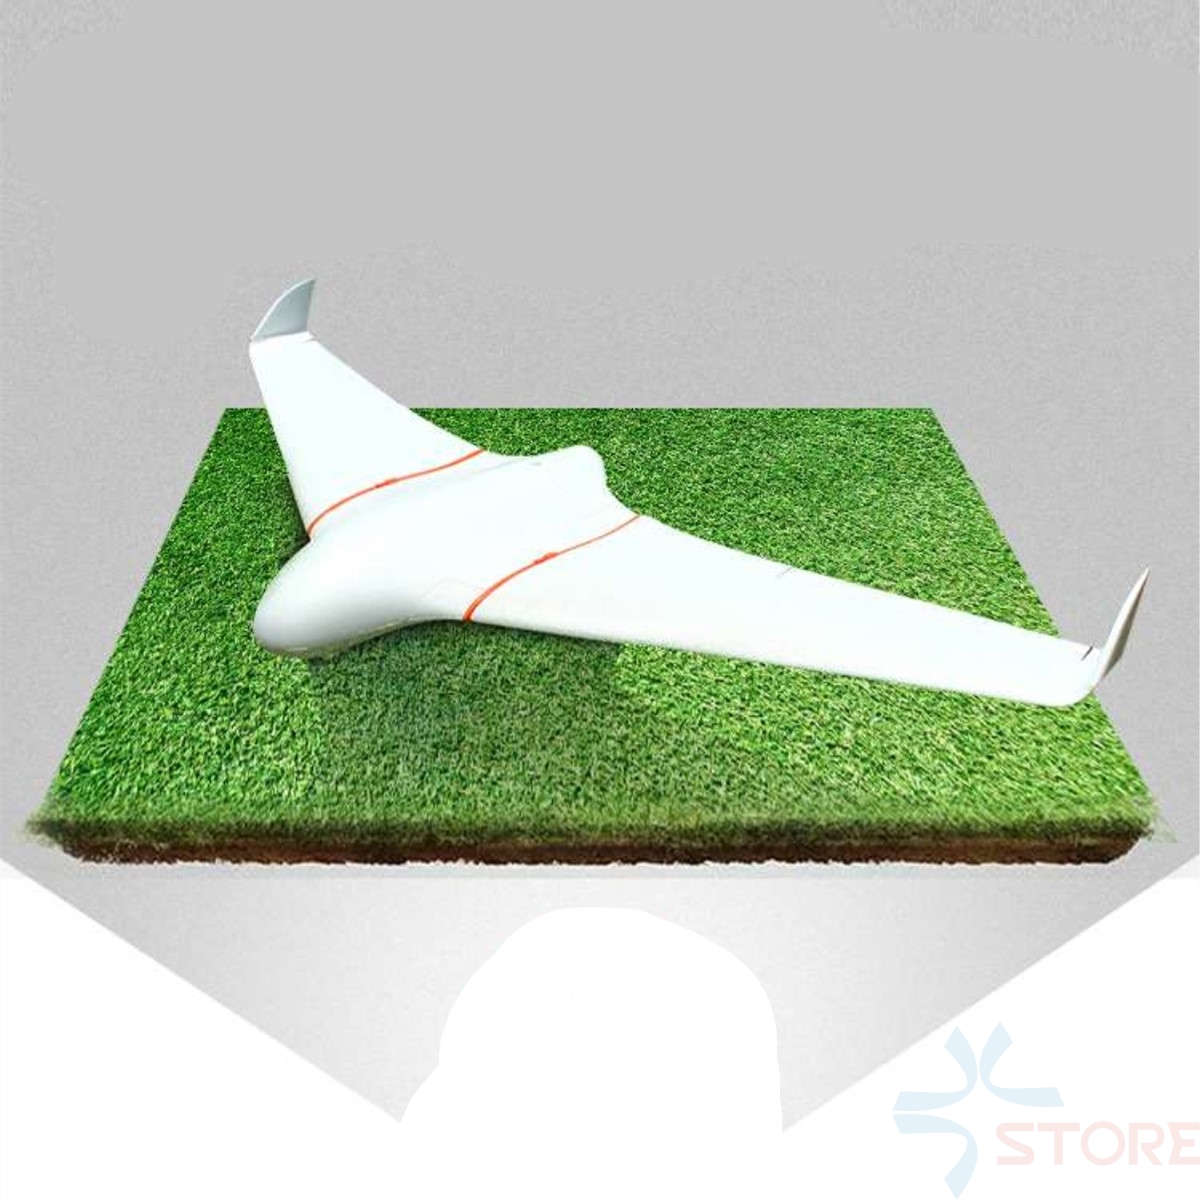 Skywalker x8 x-8 white UAV Flying Wing 2122mm epo large flying wing Best FPV airplane kit 2120mm big plane rc plane kit black fpv fixed wing skywalker x8 x 8 epo uav flying wing fpv rc airplene remote controller toy